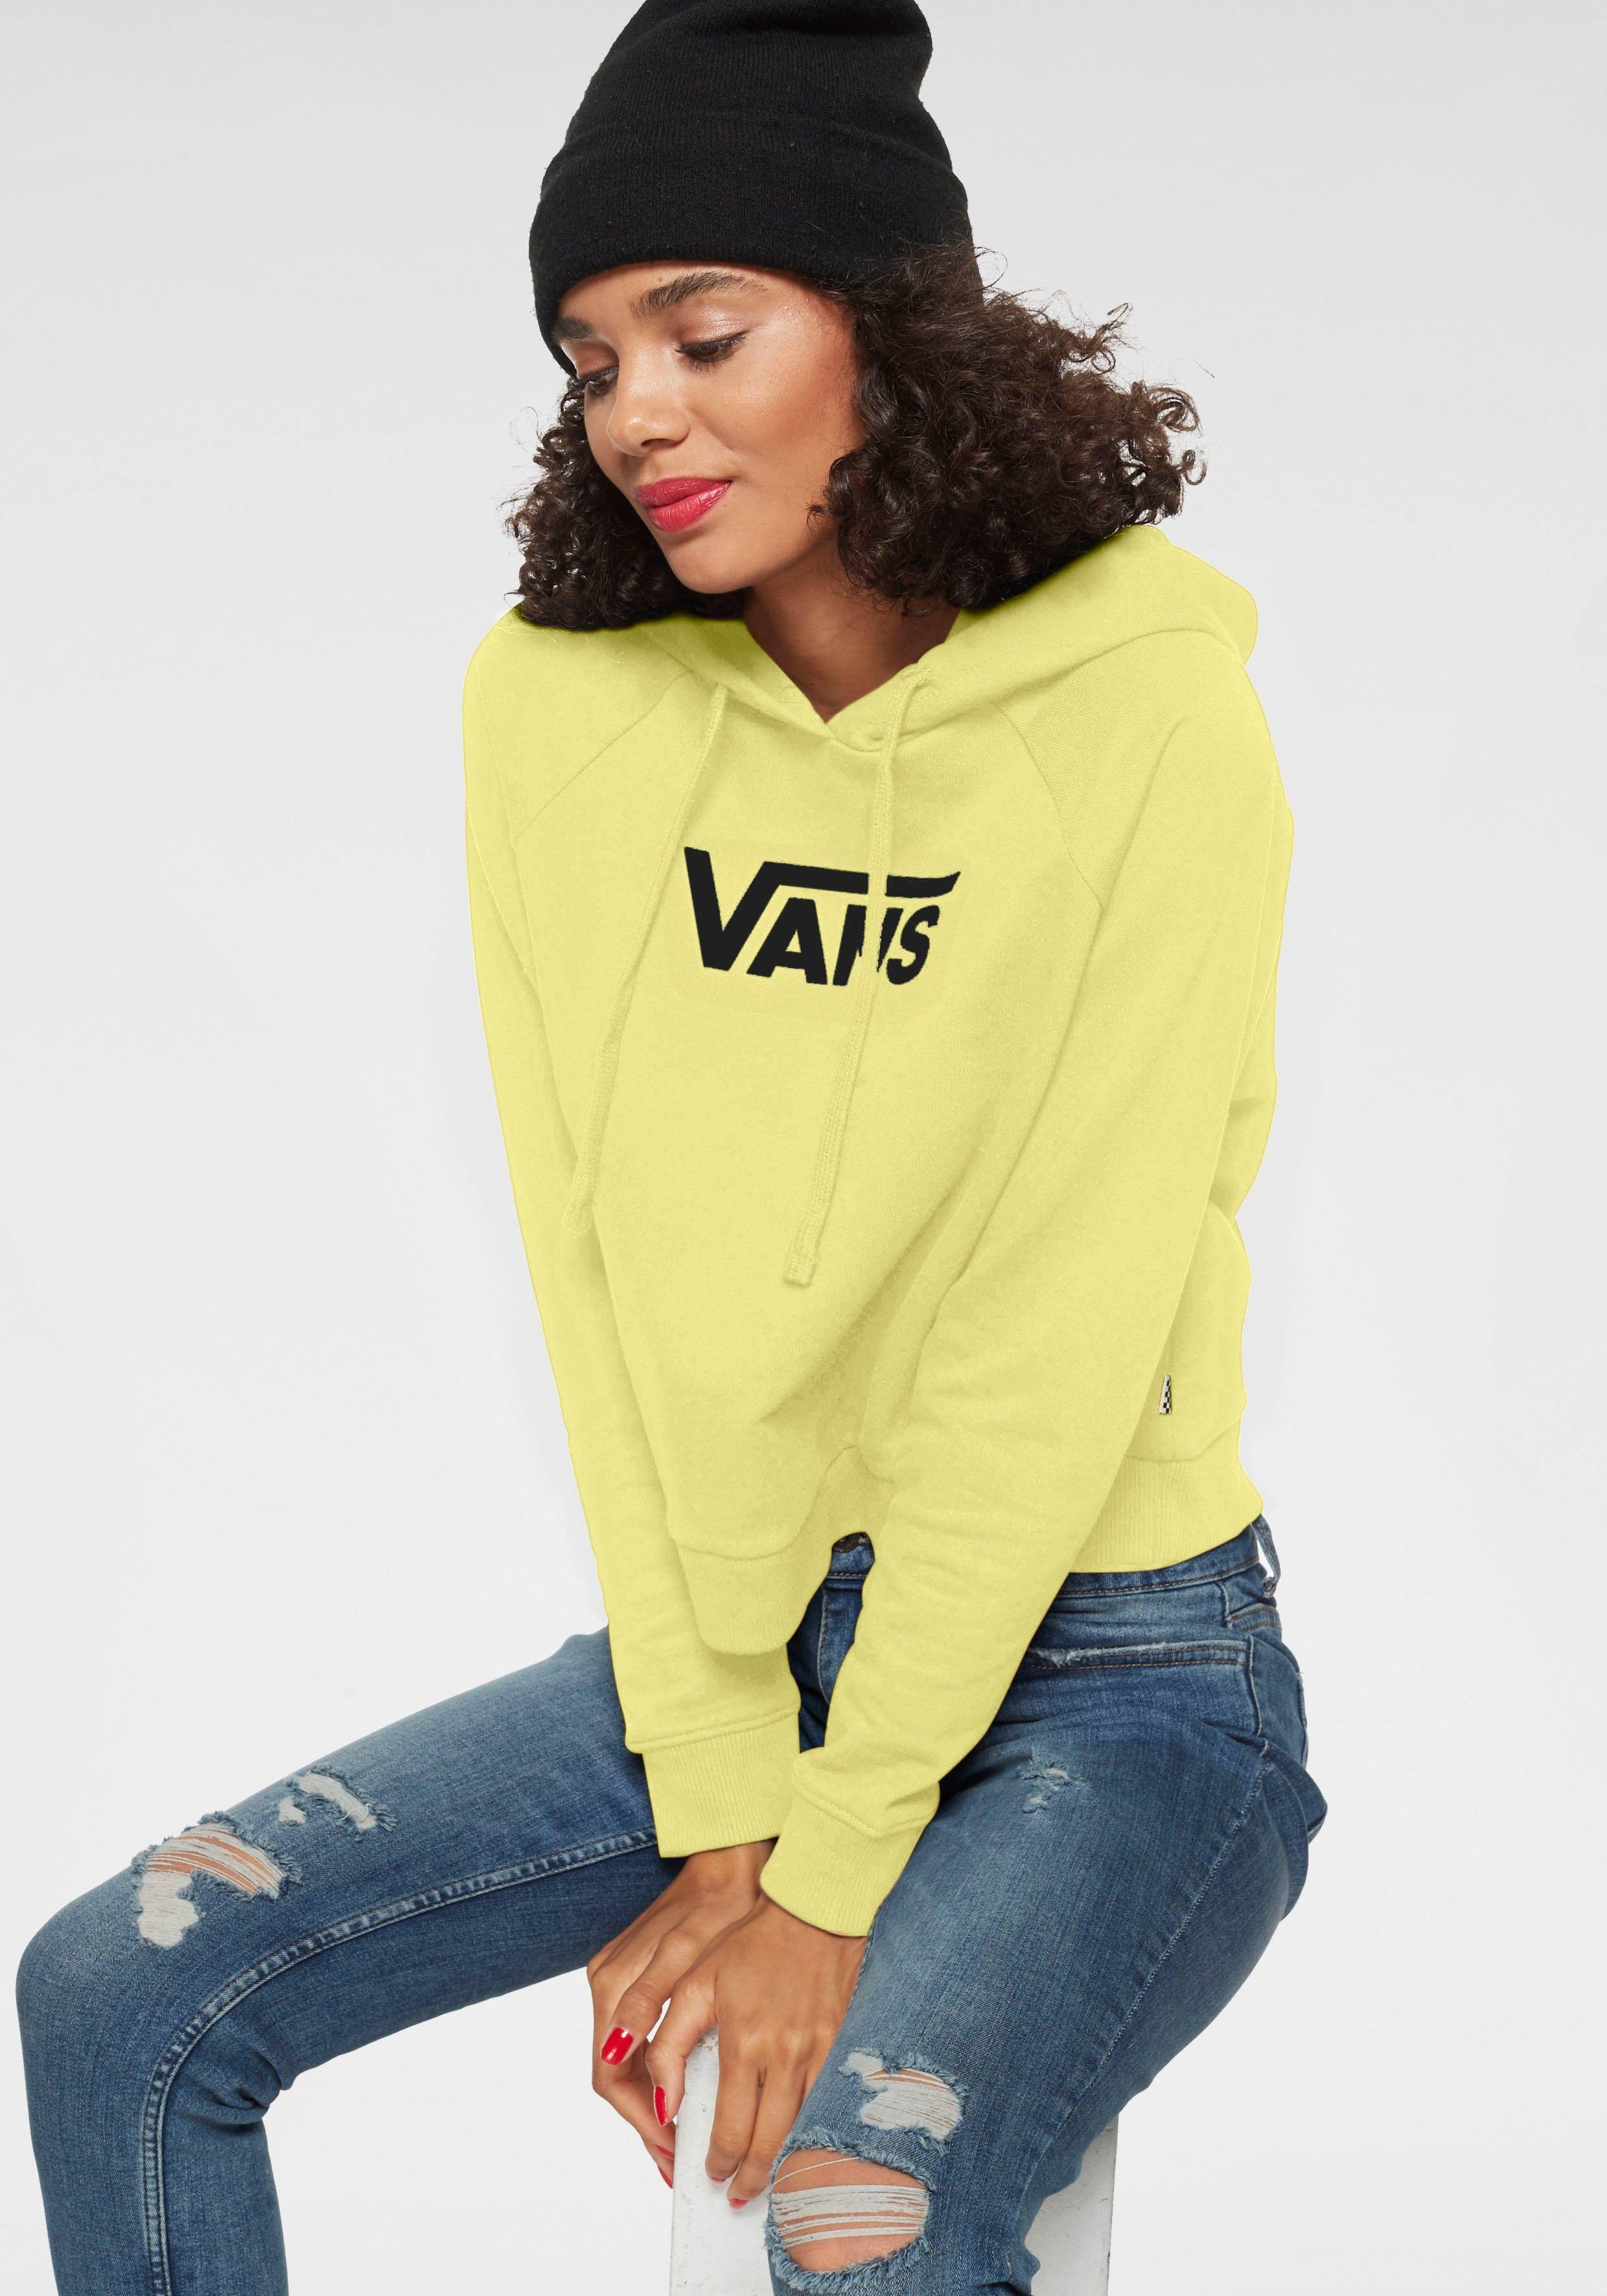 VANS hoodie »FLYING V FT BOXING HOODIE« voordelig en veilig online kopen